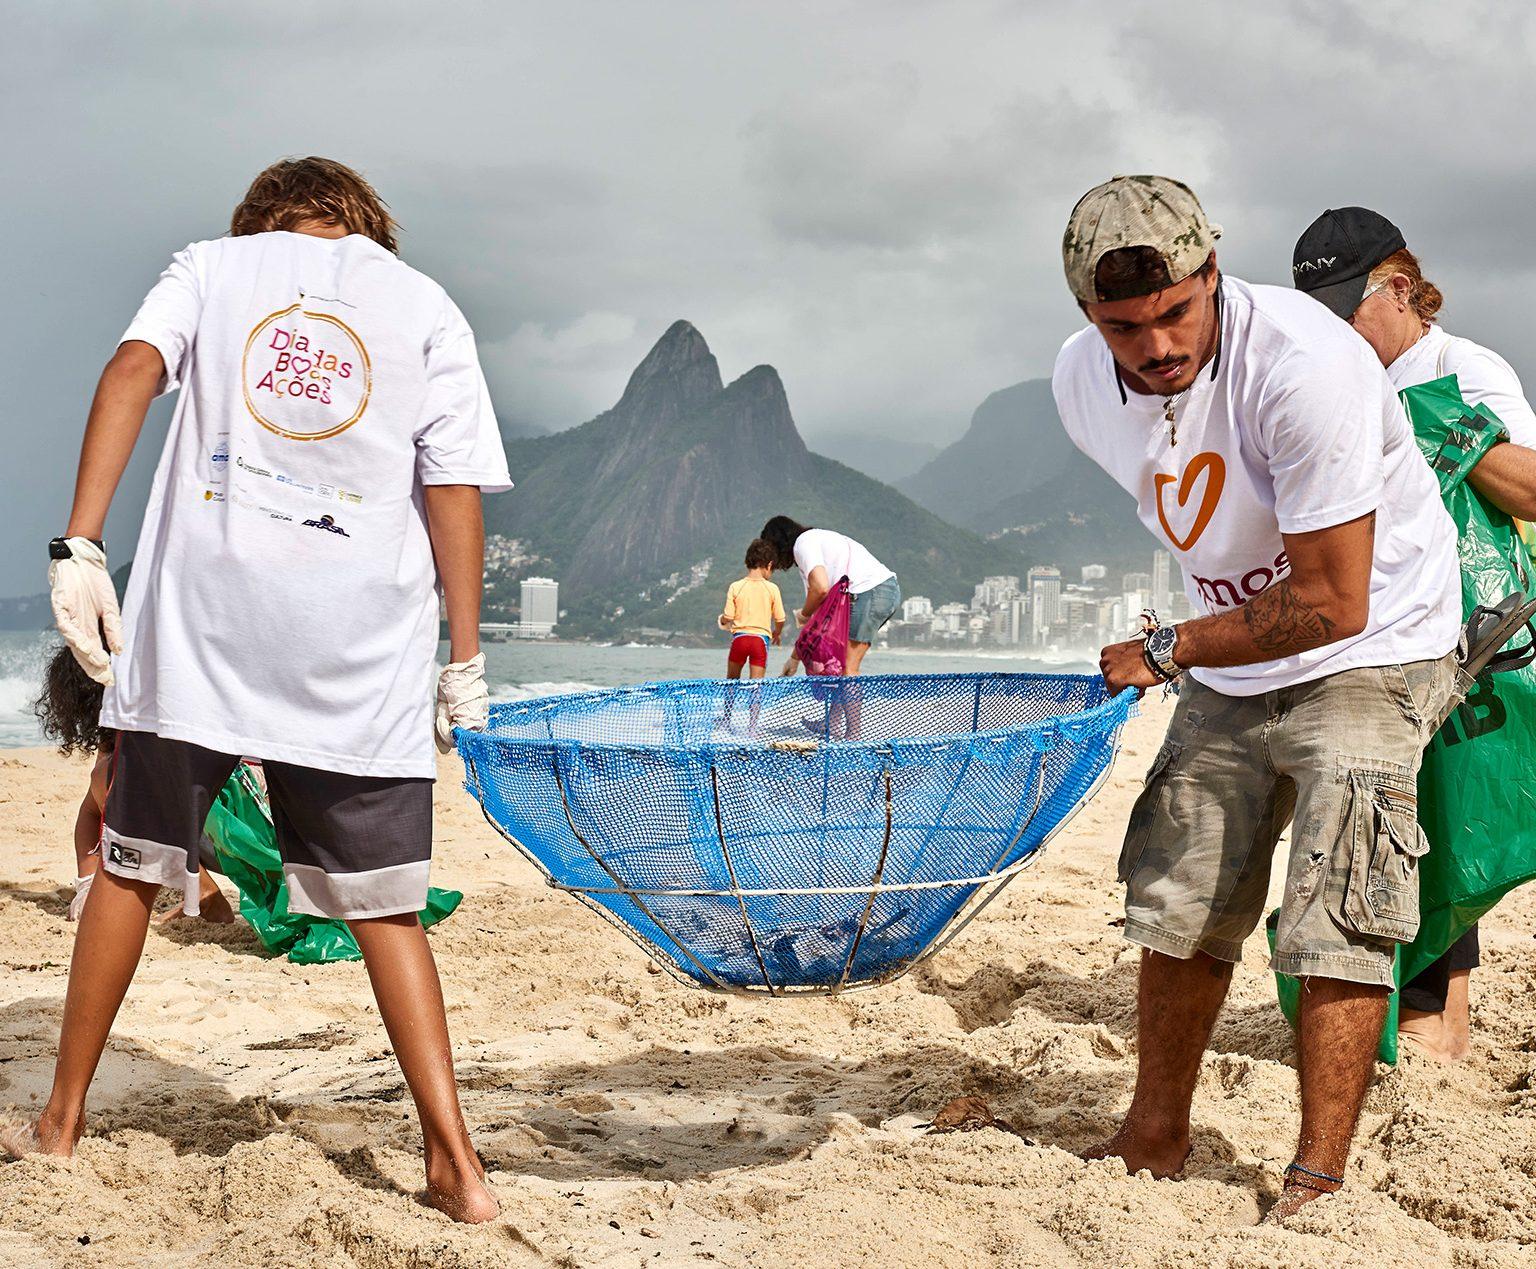 Good Deeds Day in Brazil